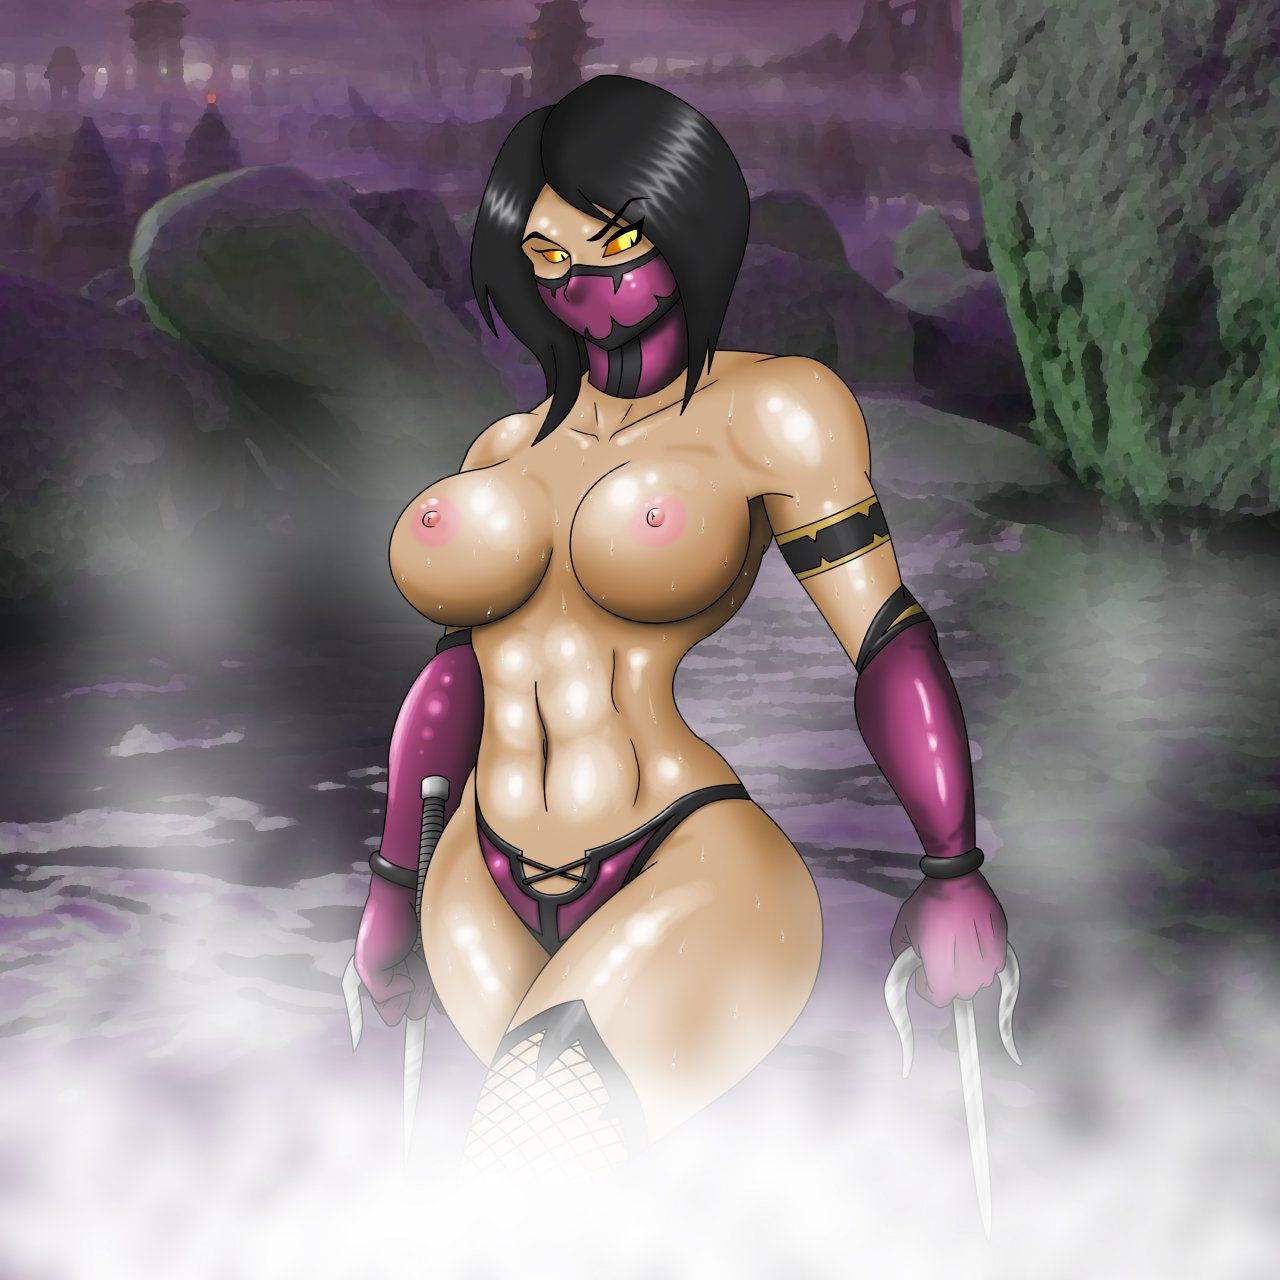 Grasshopper reccomend hot naked mortal kombat girls